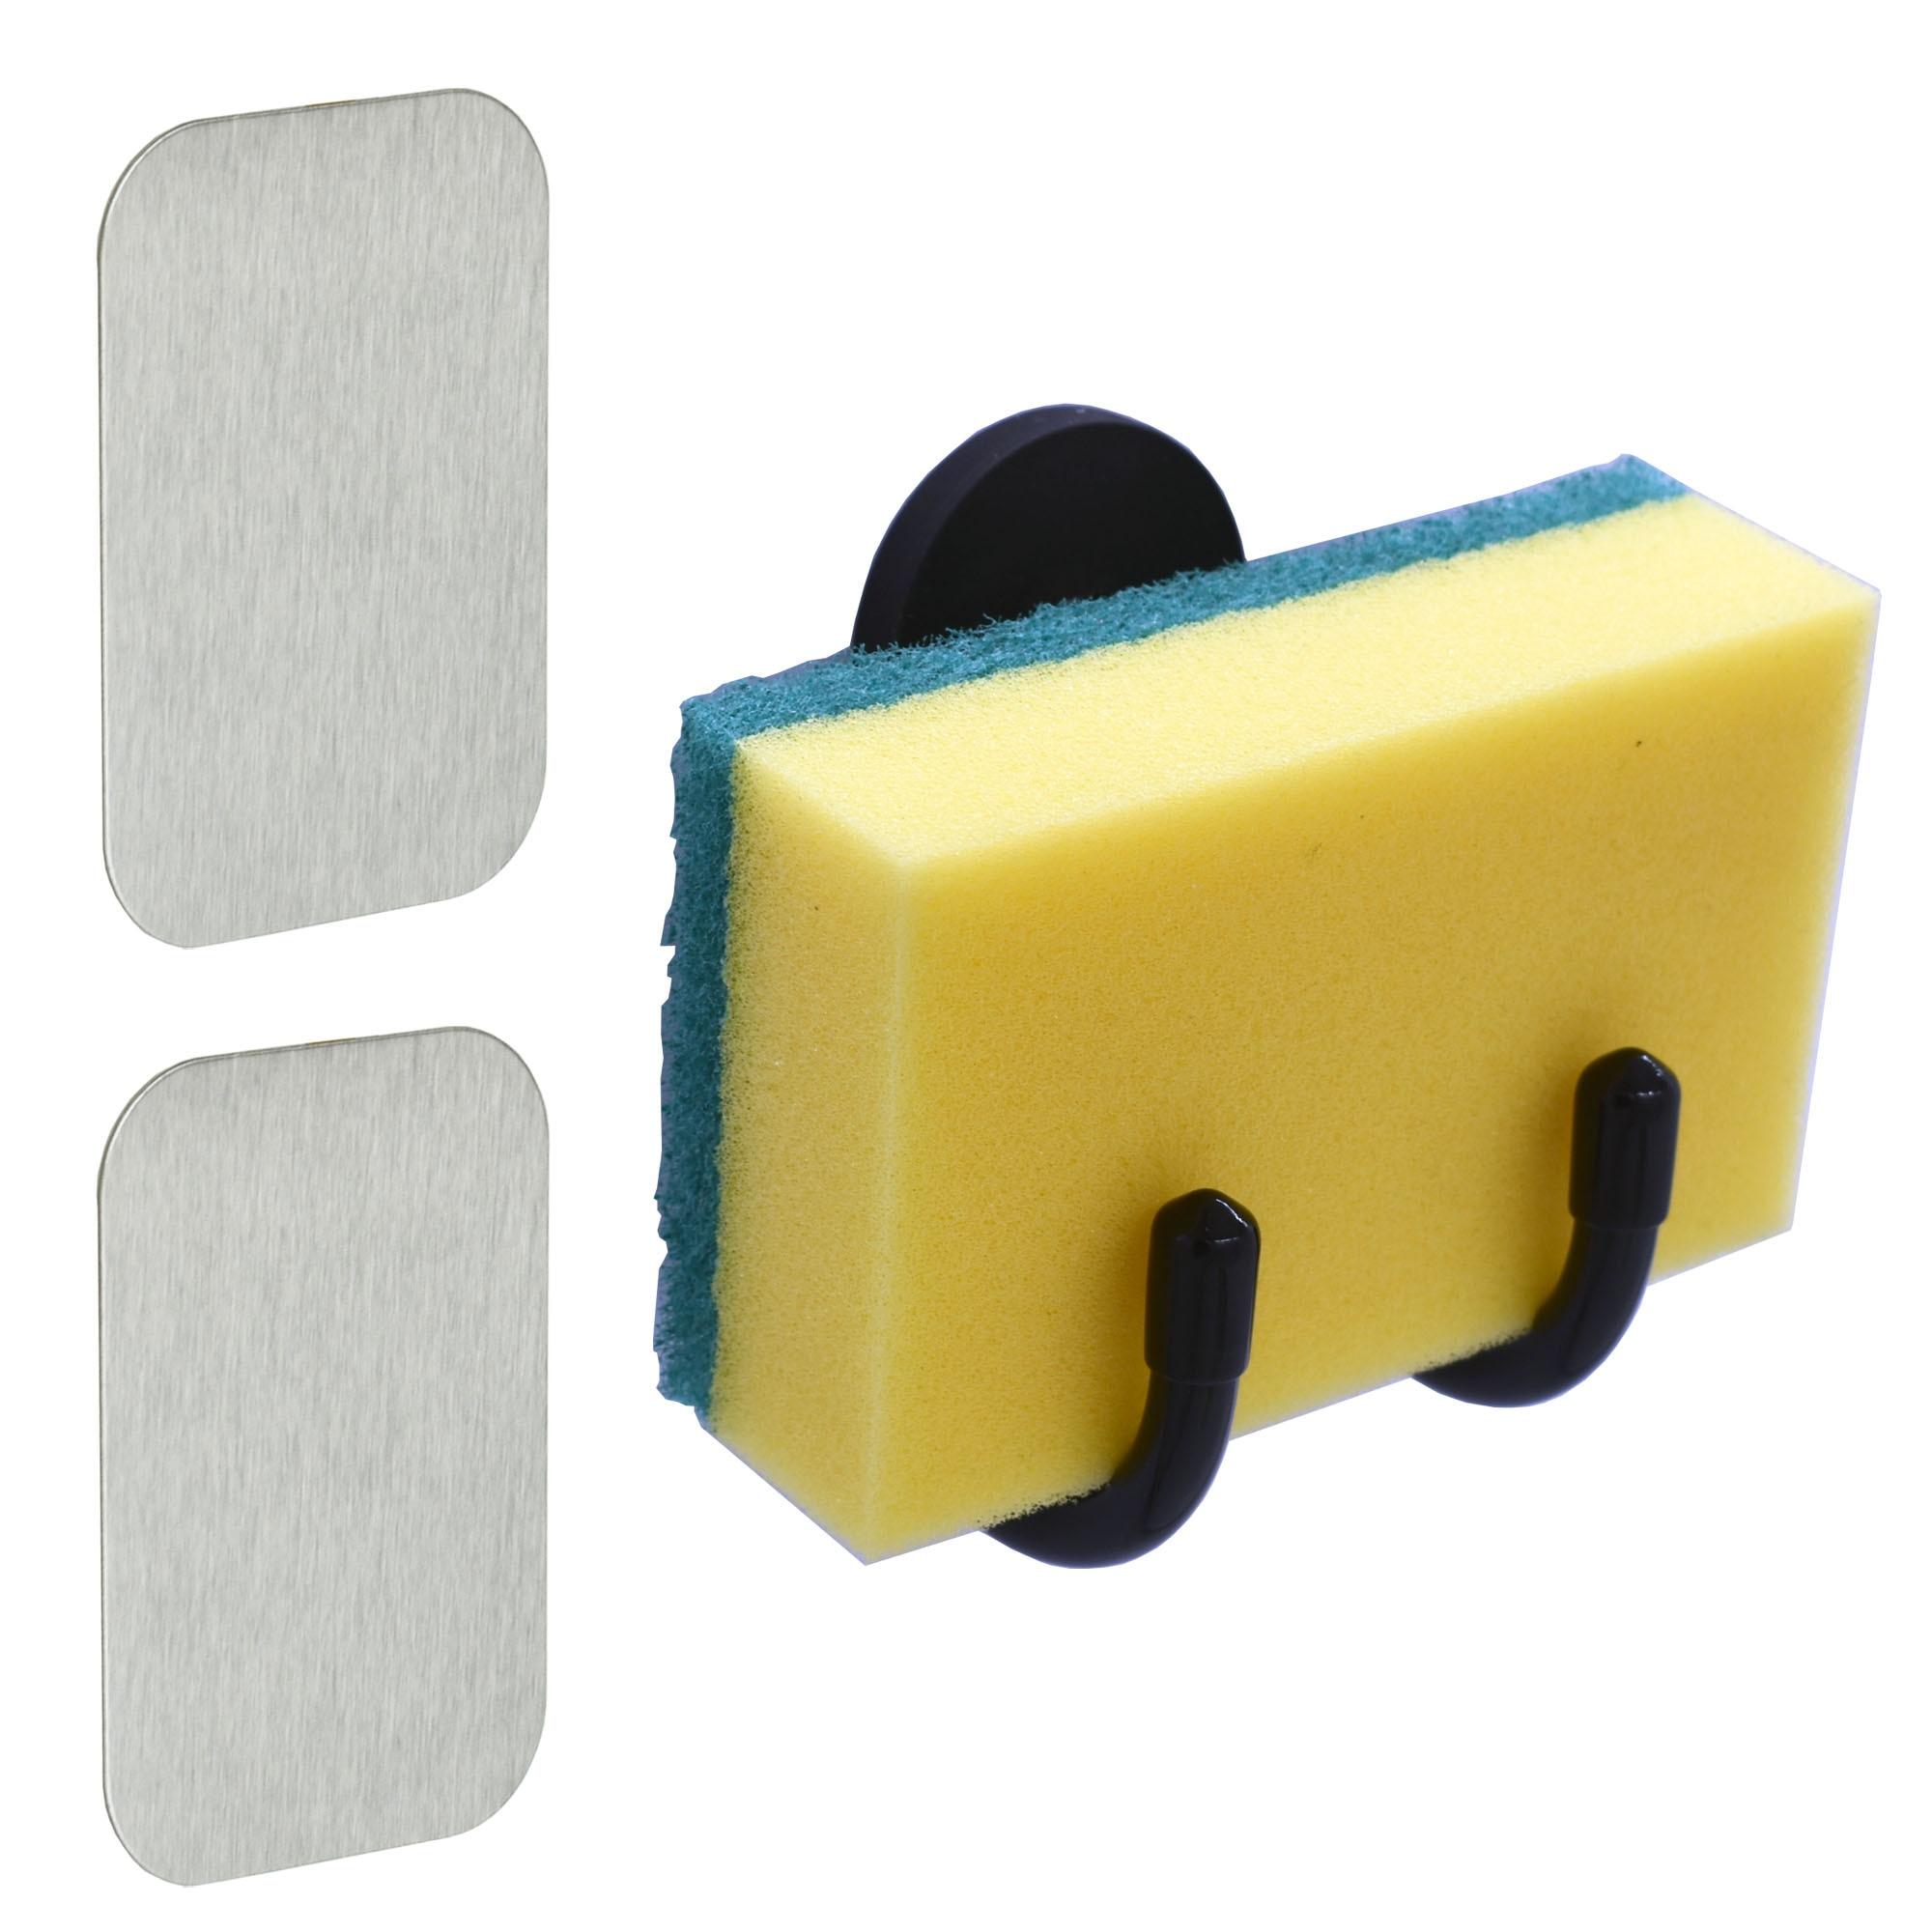 Magnetic Sink Holder Sponge Holder Dish Wand Holder Brushes Holder - No Rust No Suction Cups - 1/PK